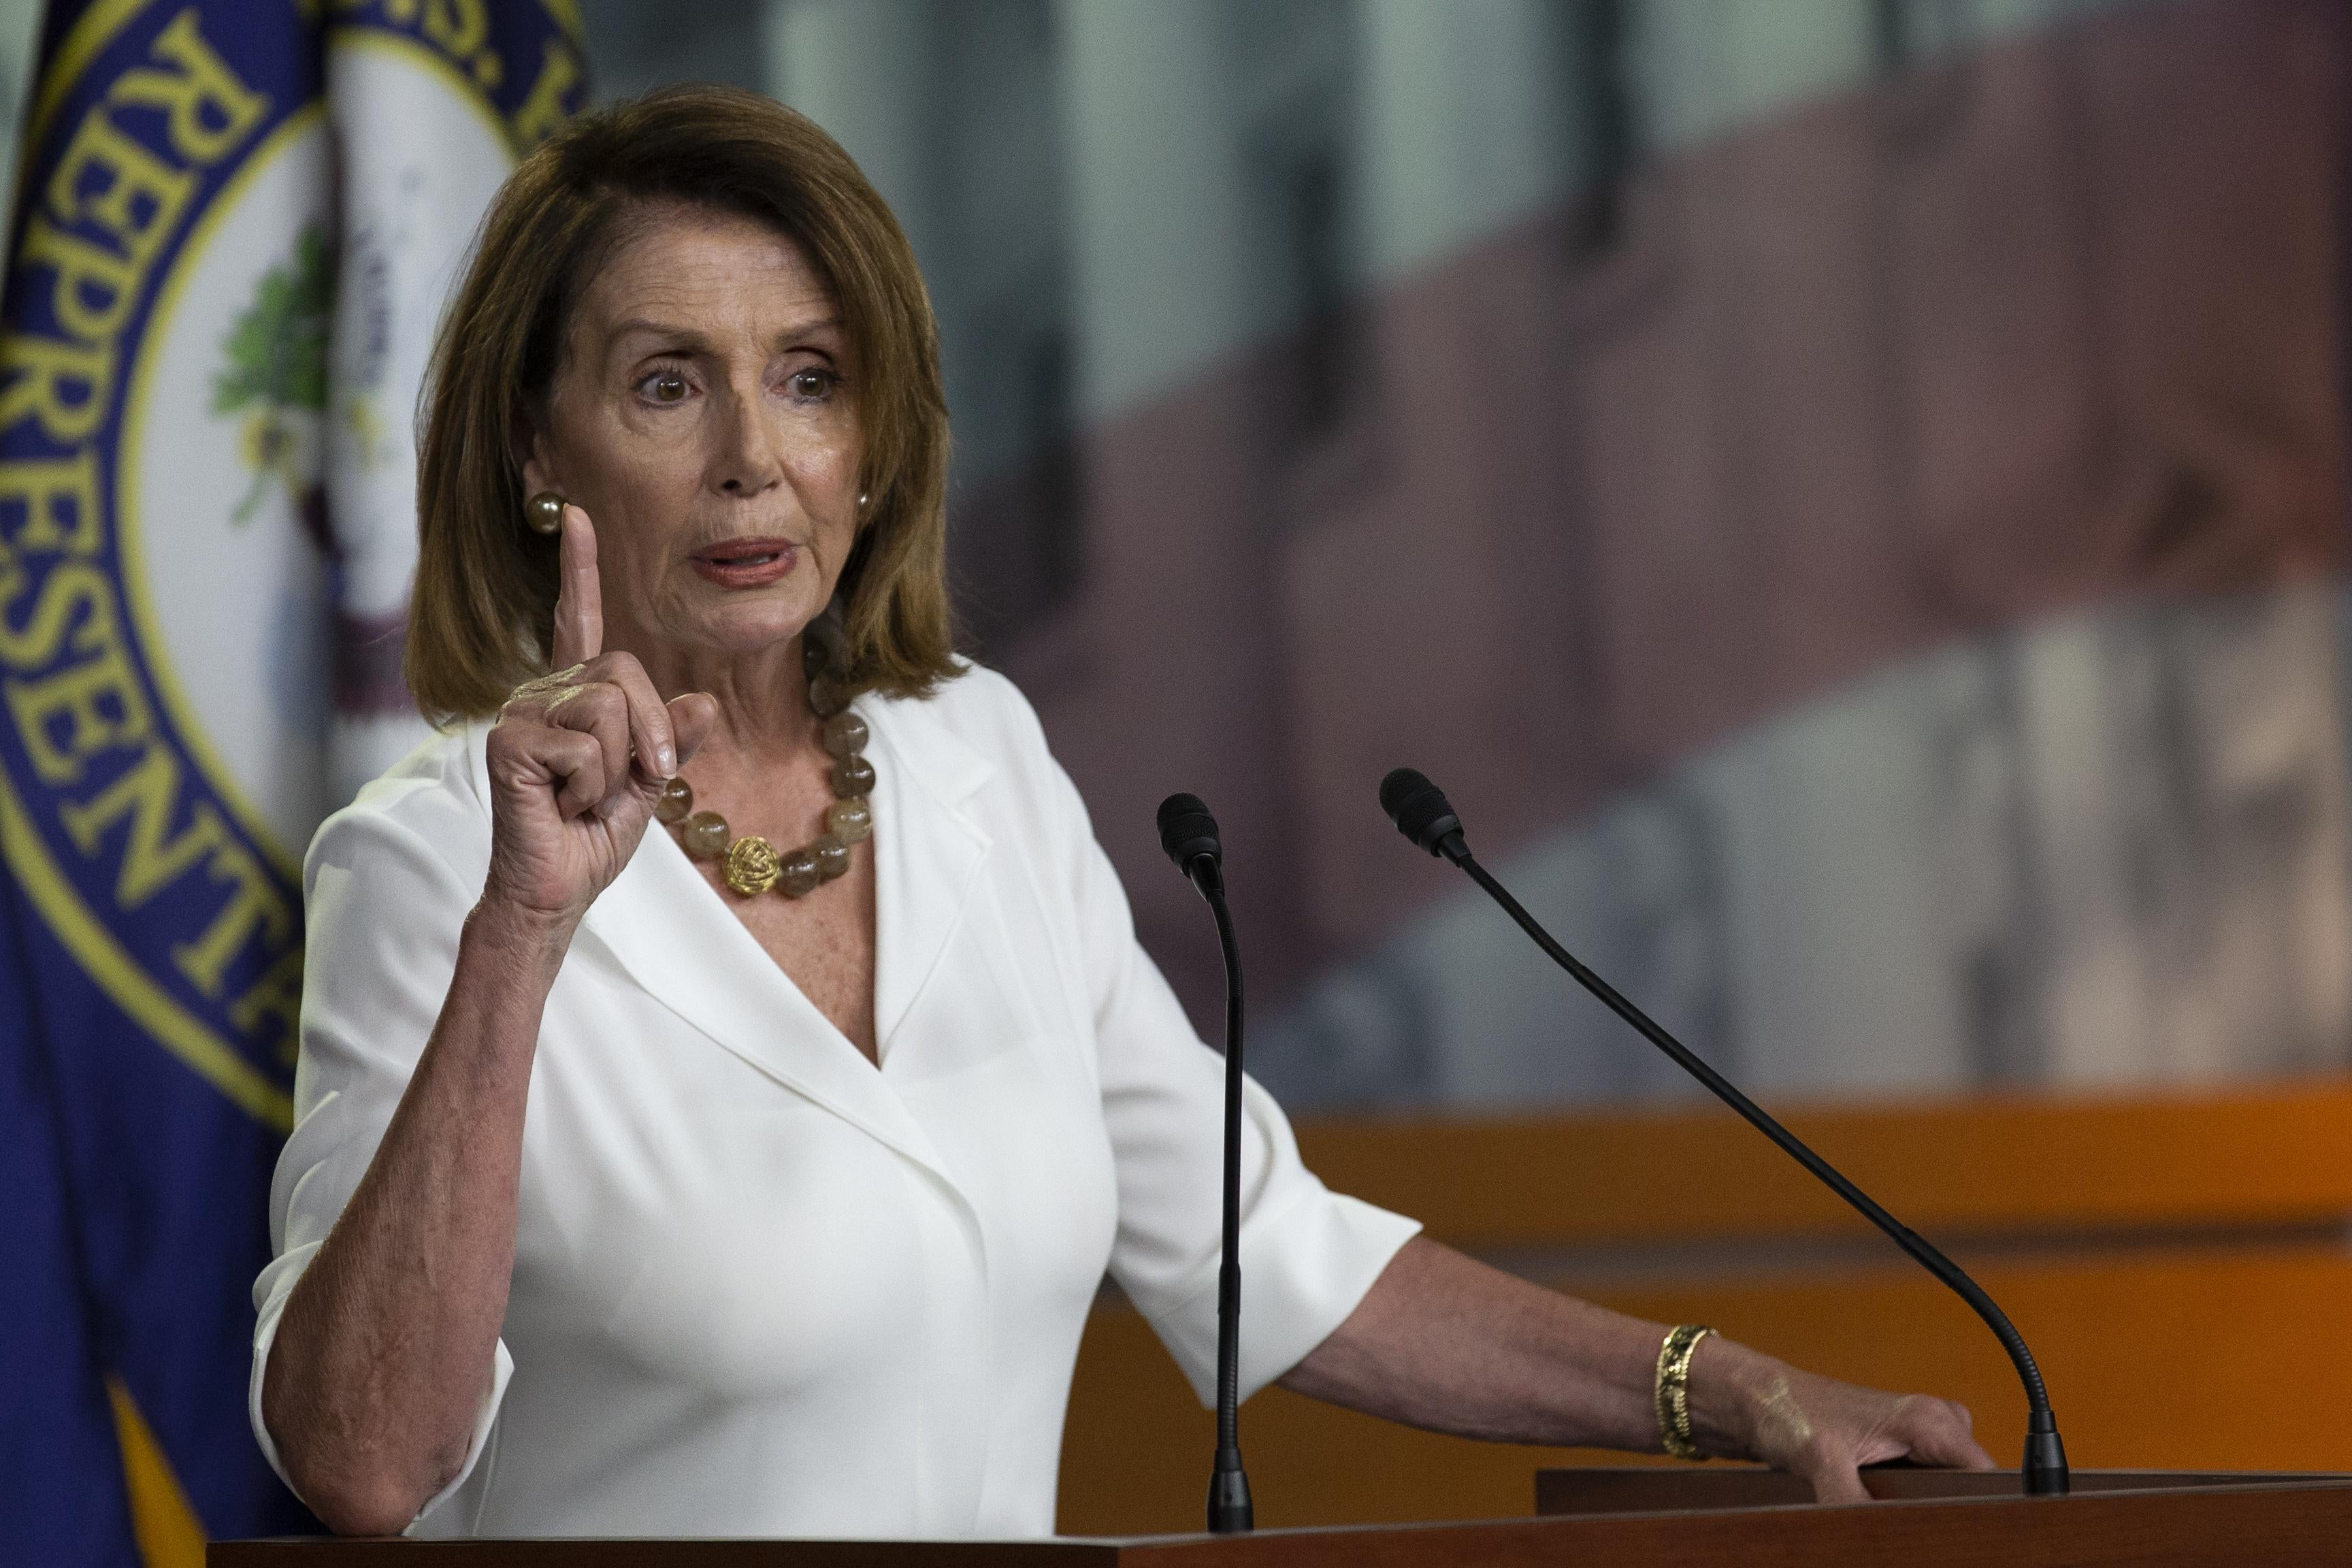 House Minority Leader Nancy Pelosi speaks with reporters on July 12, 2018 in Washington, D.C.